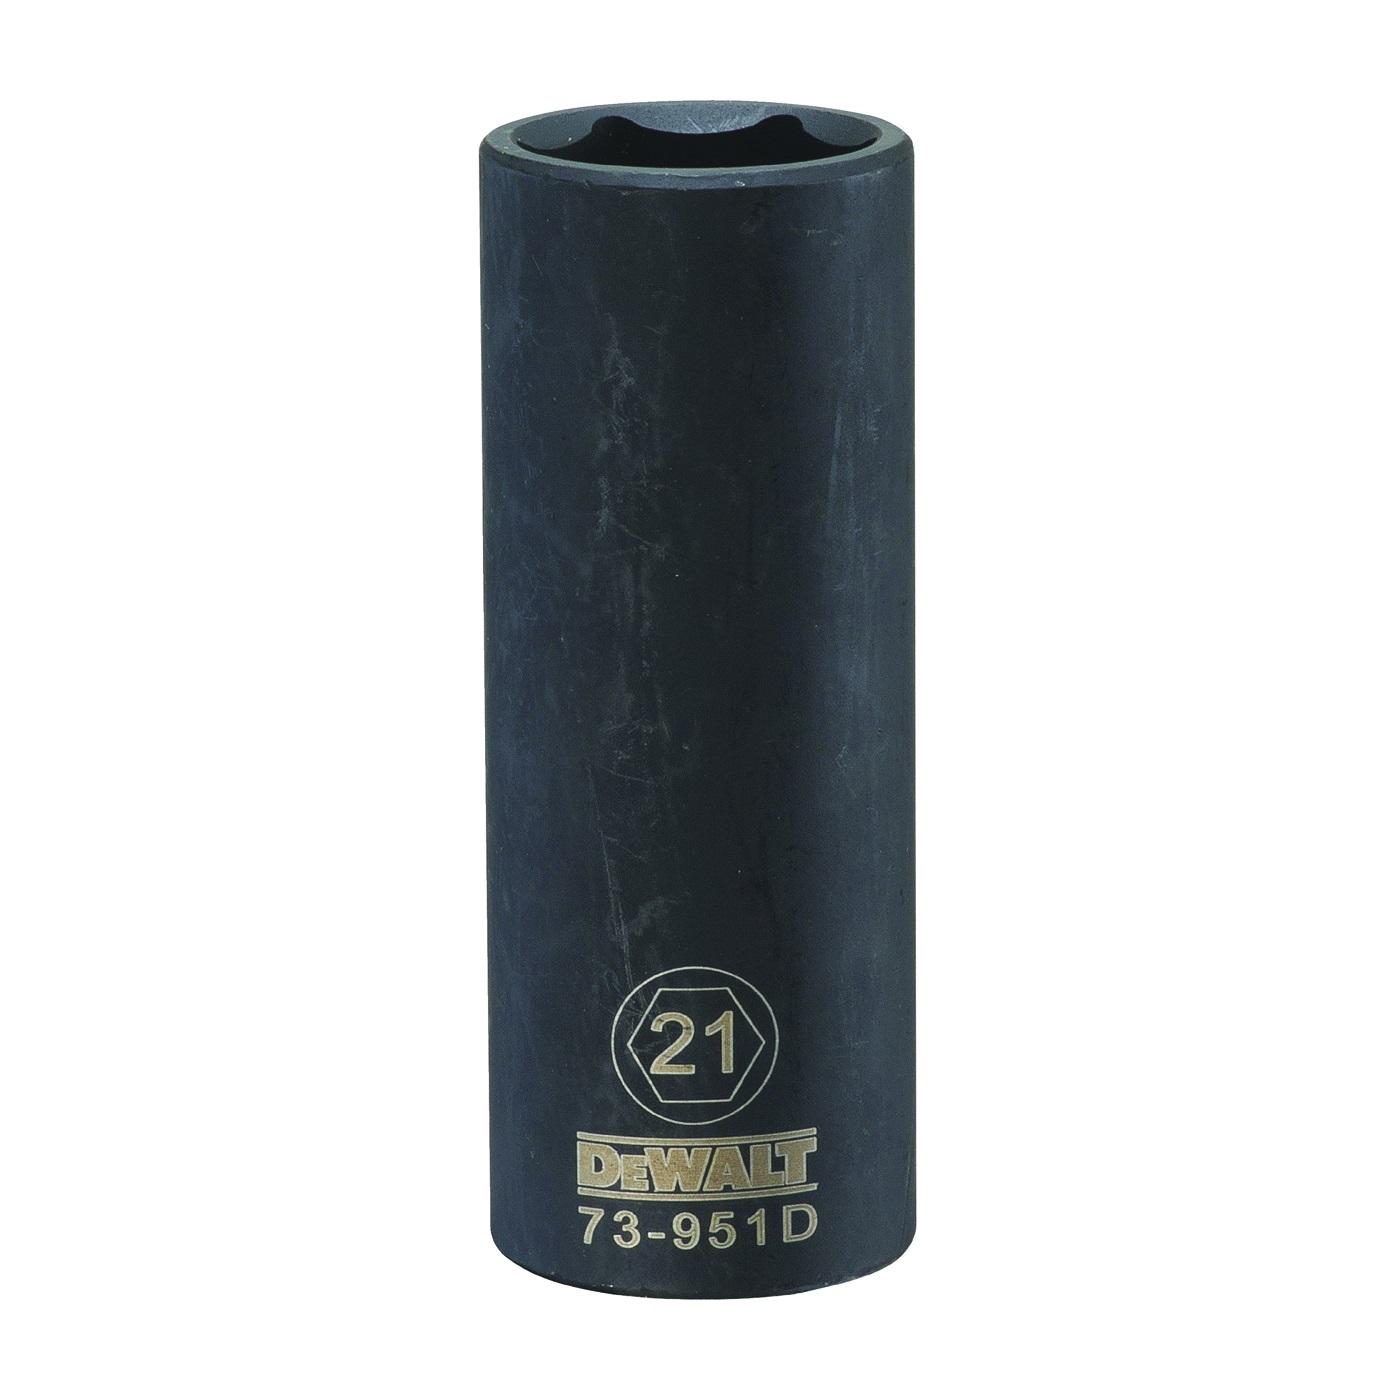 Picture of DeWALT DWMT73951OSP Impact Socket, 21 mm Socket, 1/2 in Drive, 6 -Point, CR-440 Steel, Black Oxide